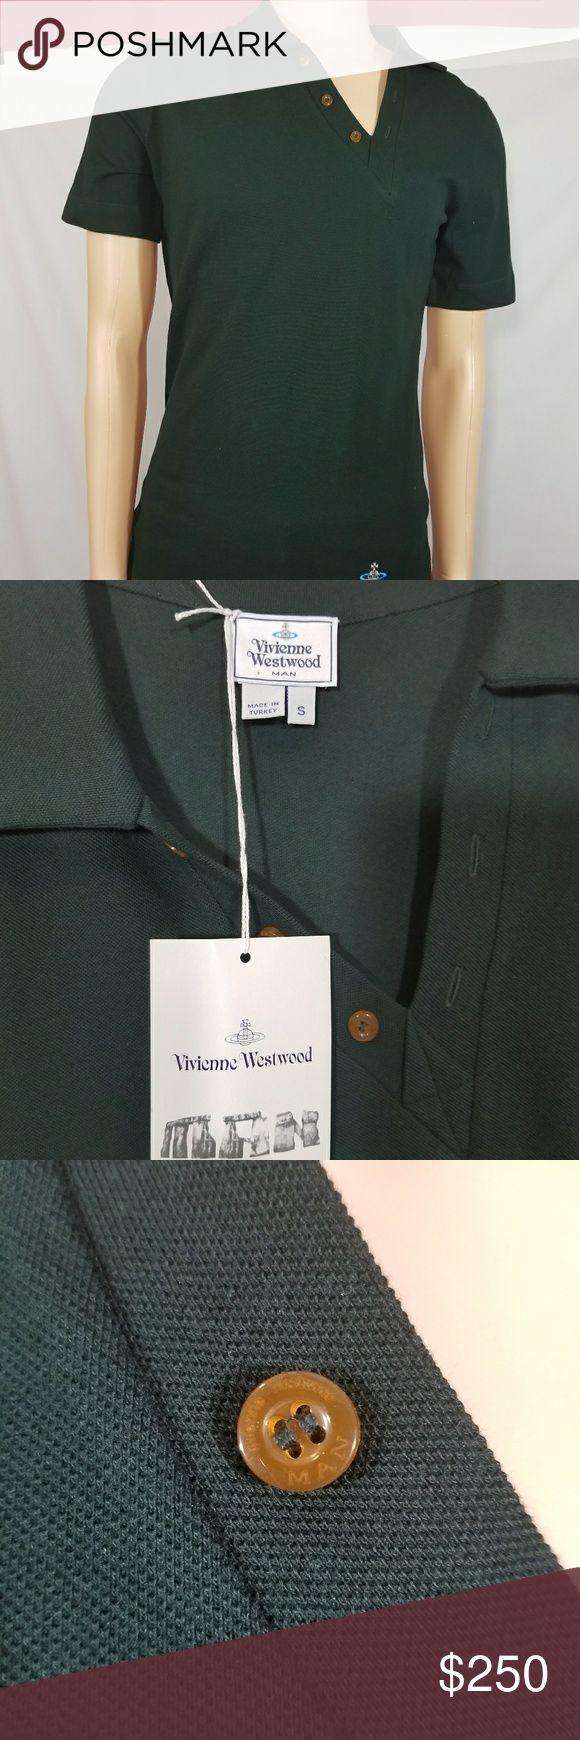 Men's Vivienne Westwood polo Men's Vivienne Westwood polo, dark green, size S, diagonal cut at neckline and across the bottom hem, NWT. Vivienne Westwood Shirts Polos